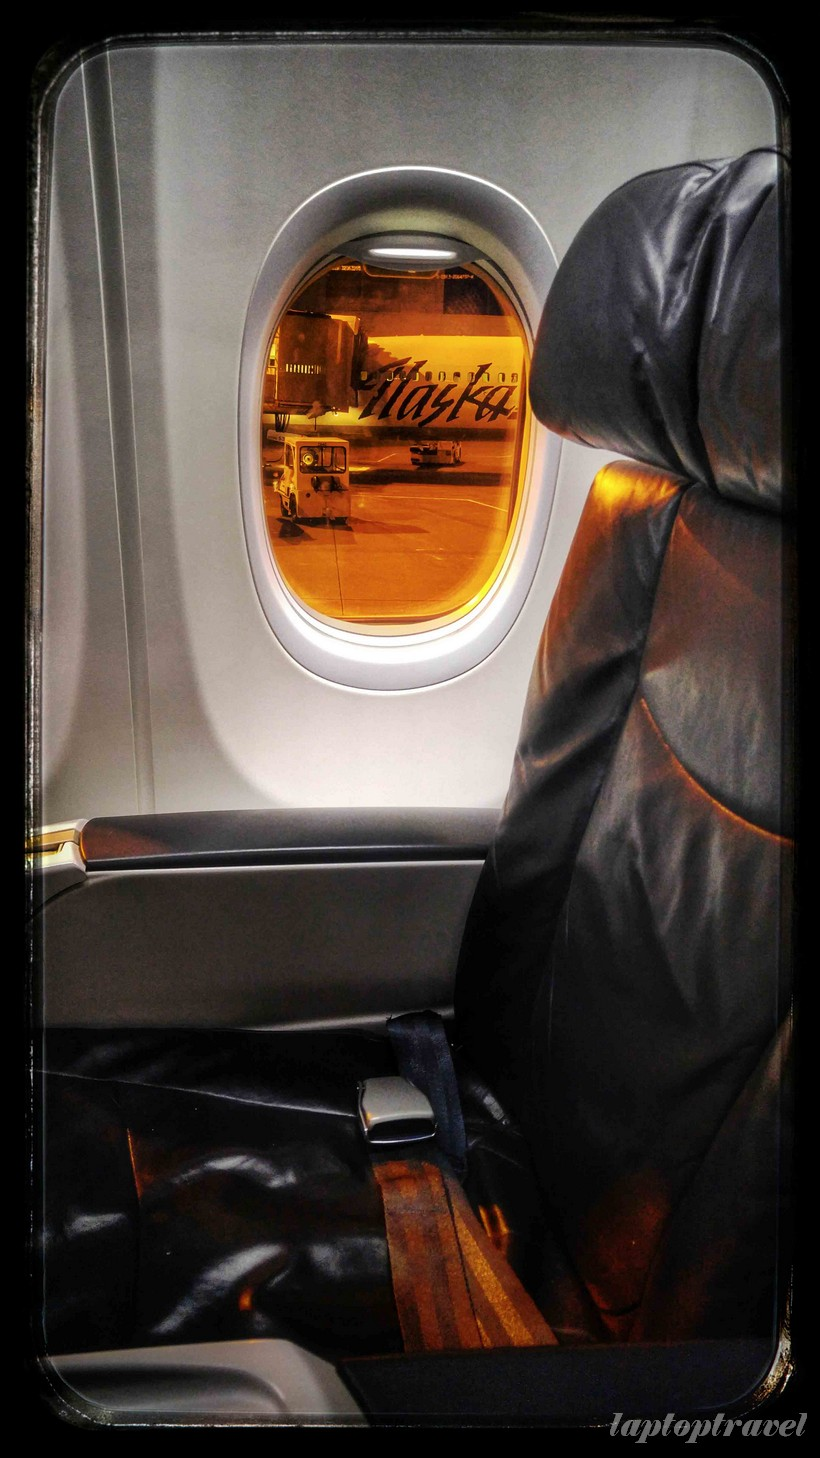 alaska airlines first class mileage run seats seating comfortable ealr morning seattle jpg